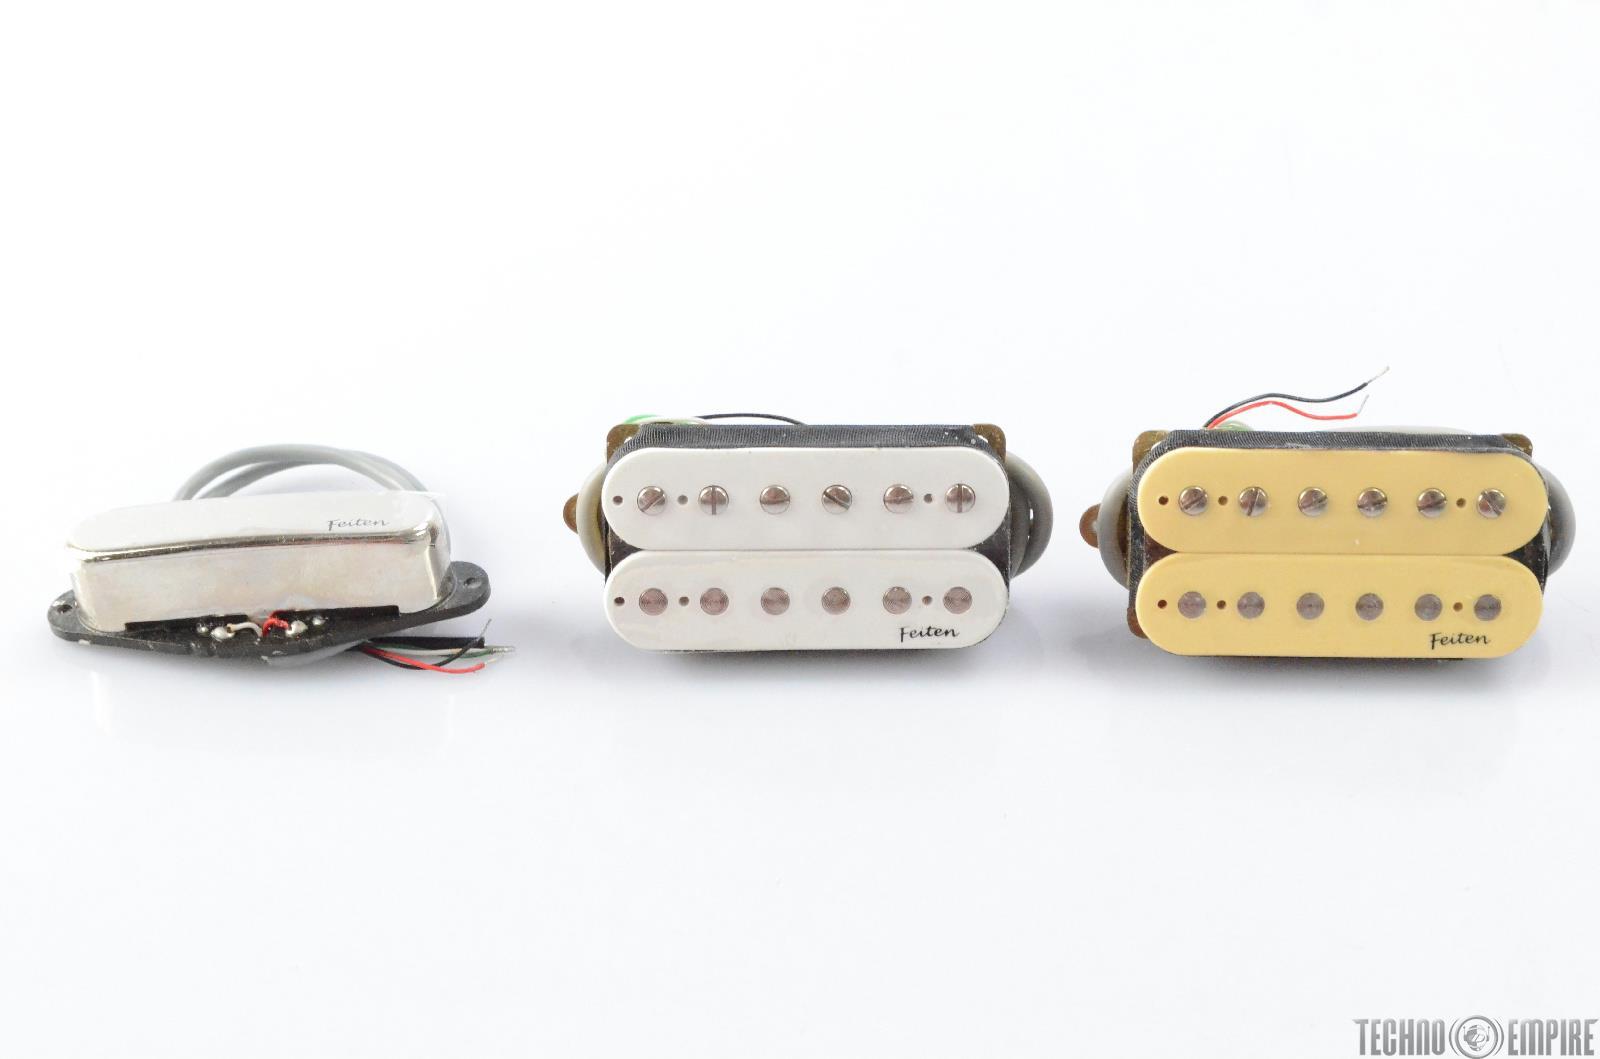 buzz feiten elite pro build your own electric guitar kit 28468 techno empire. Black Bedroom Furniture Sets. Home Design Ideas